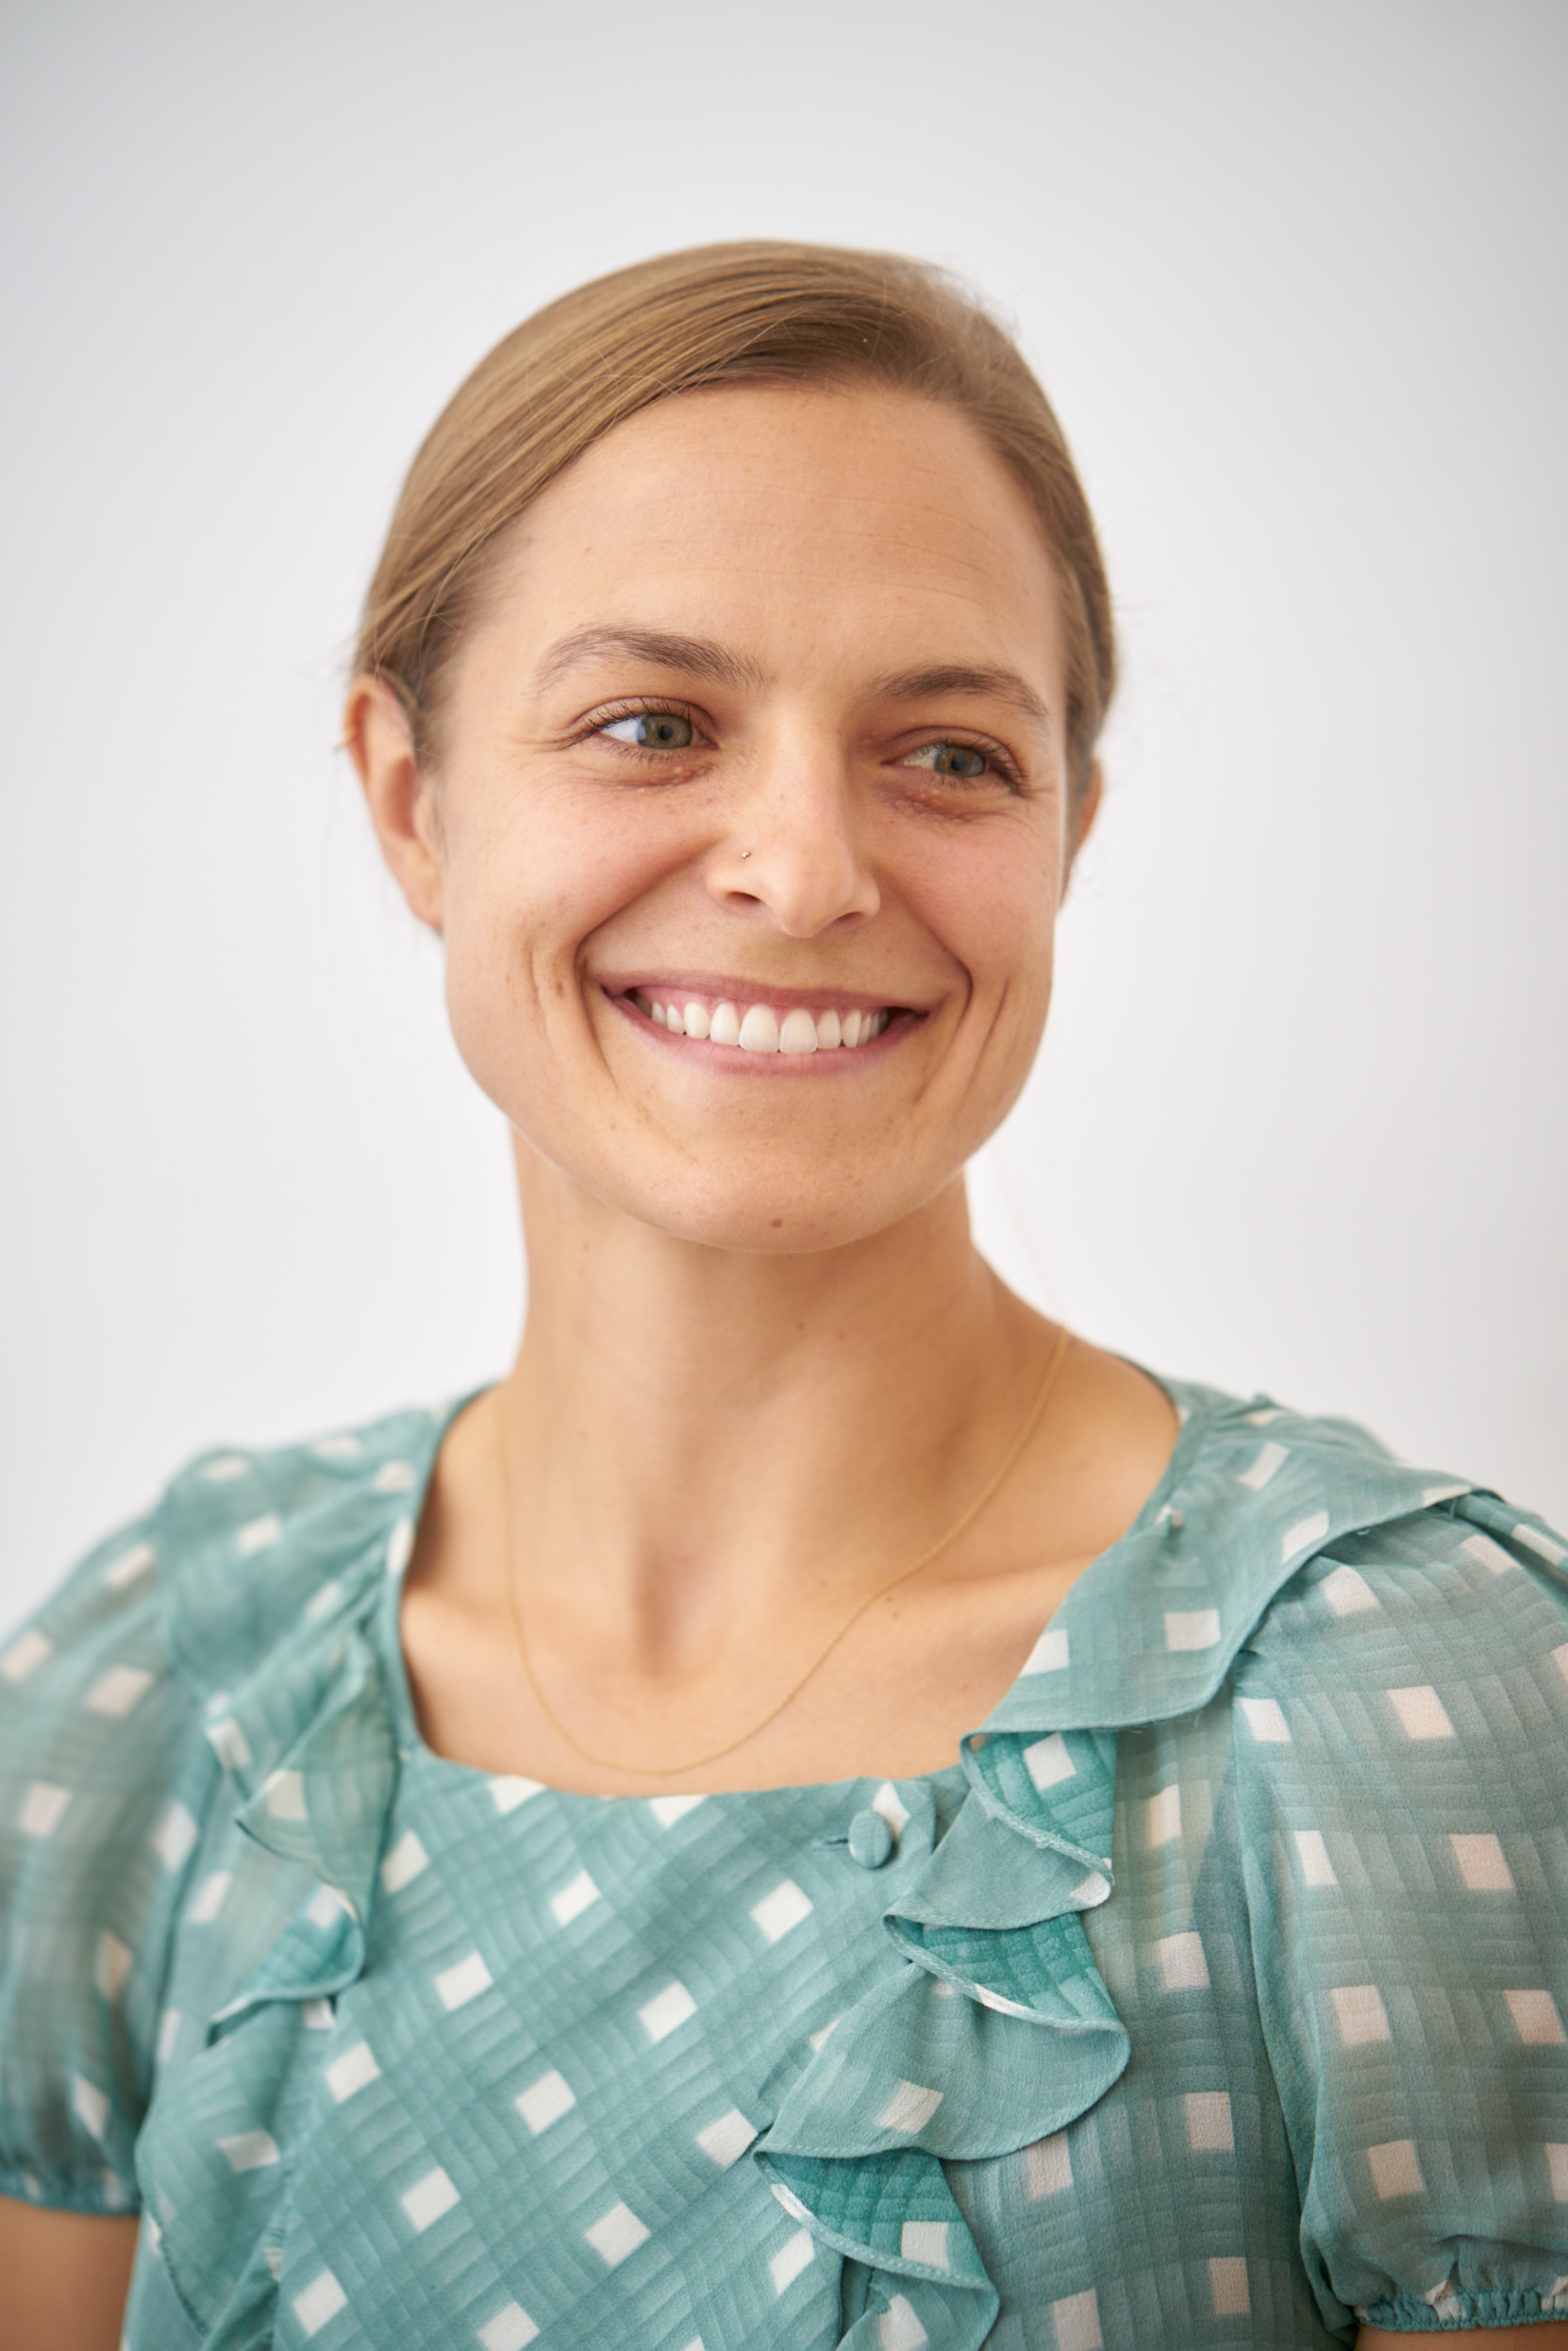 Chelsea Strautman